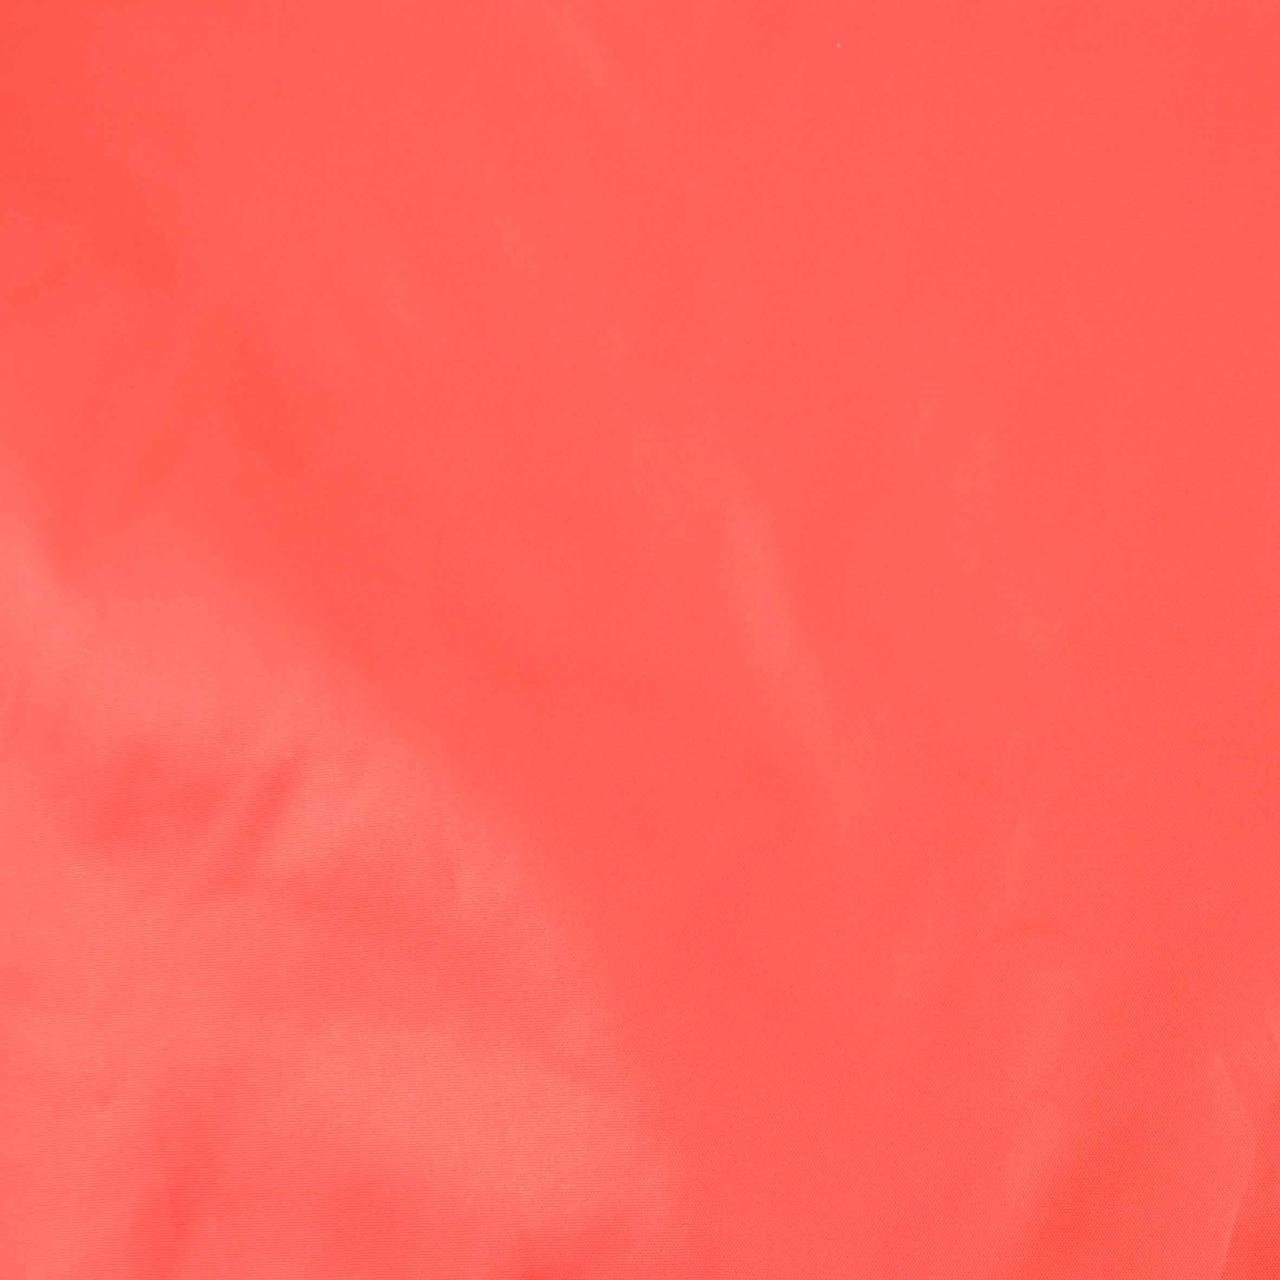 Ткань плащевка AА1 2020 21